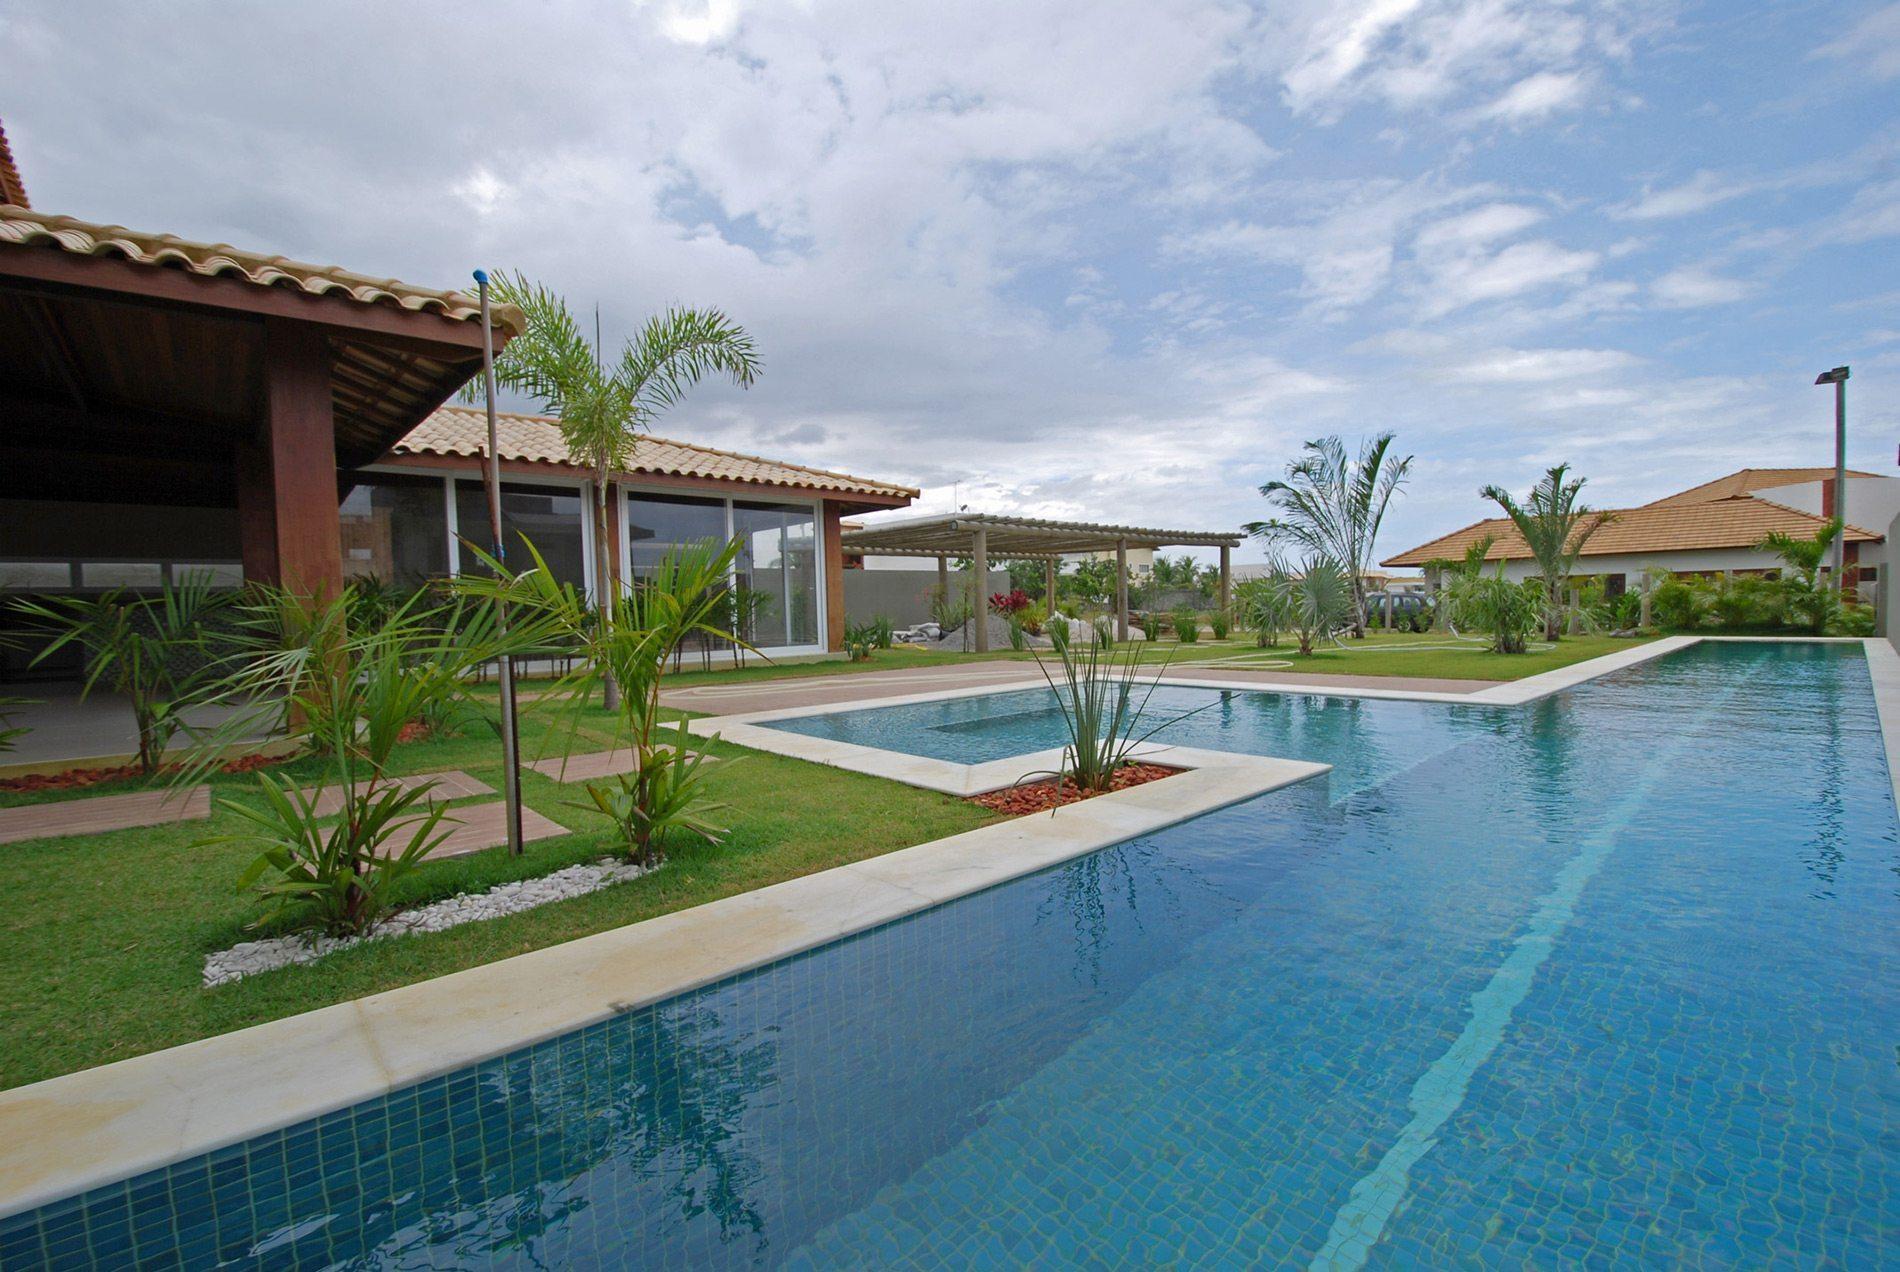 Casa com piscina a venda em busca vida hansen im veis - Piscina in casa ...